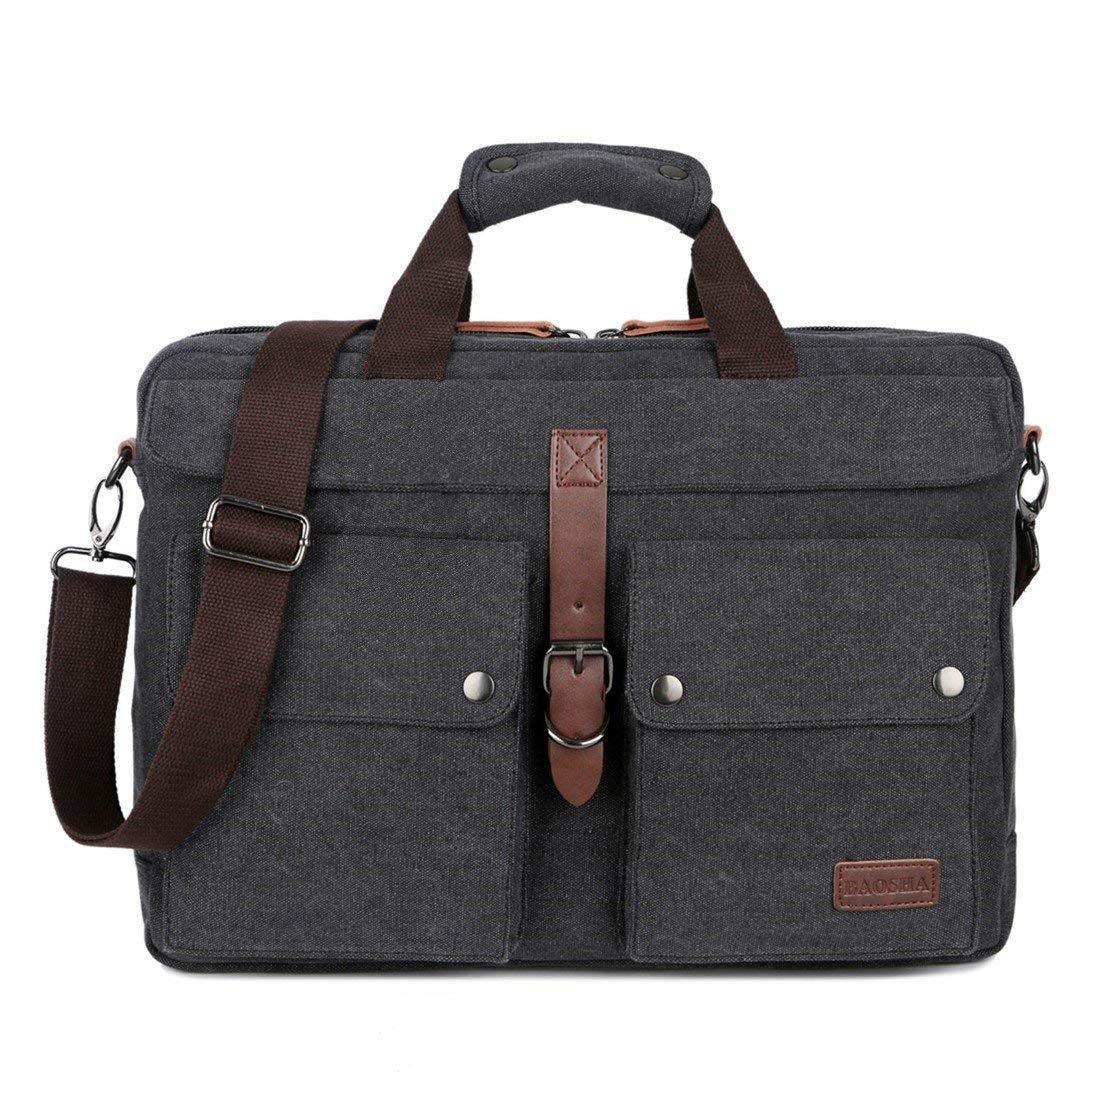 BAOSHA BC-07 17inch Canvas Laptop Computer Bag Messenger Bag Multicompartment Briefcase (Black) by Baosha